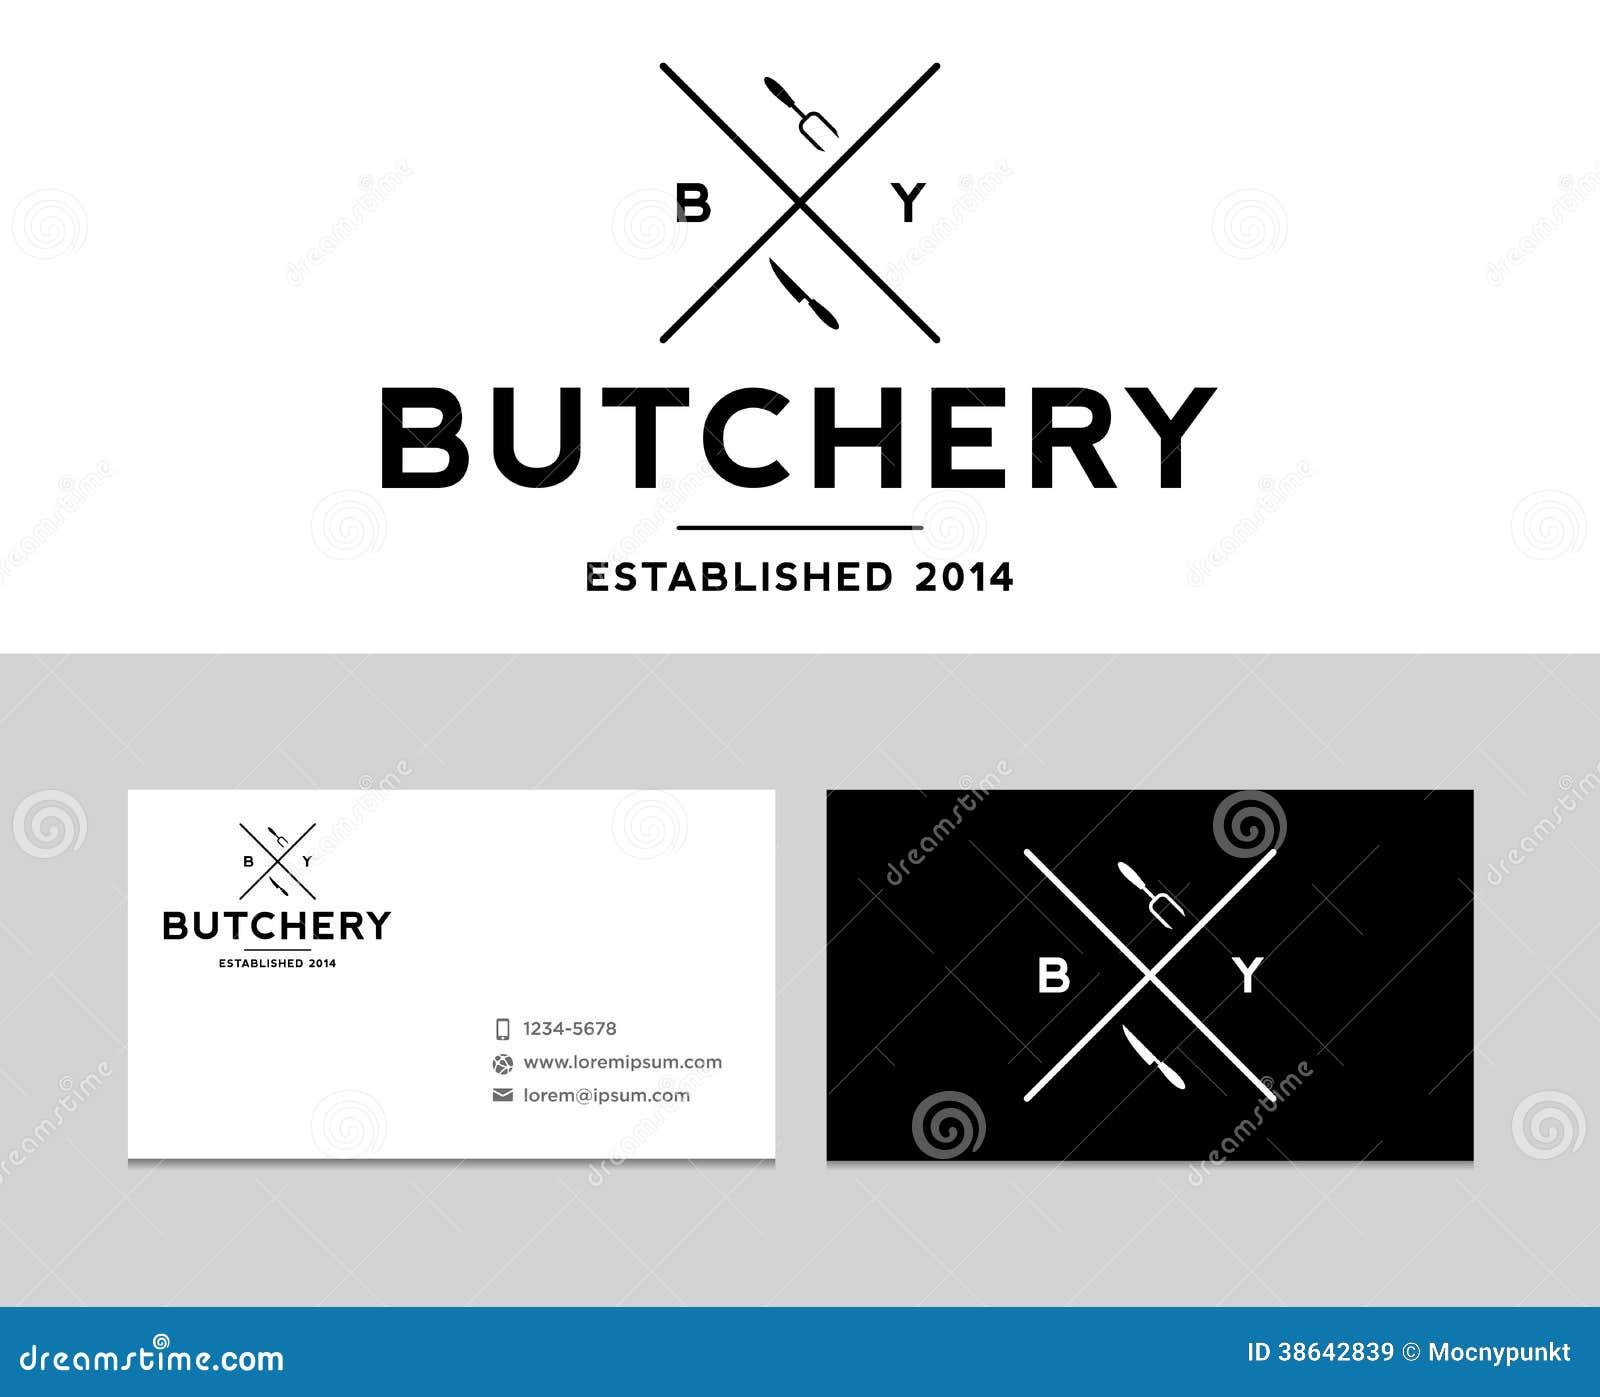 A Sample Butchery / Meat Shop Business Plan Template